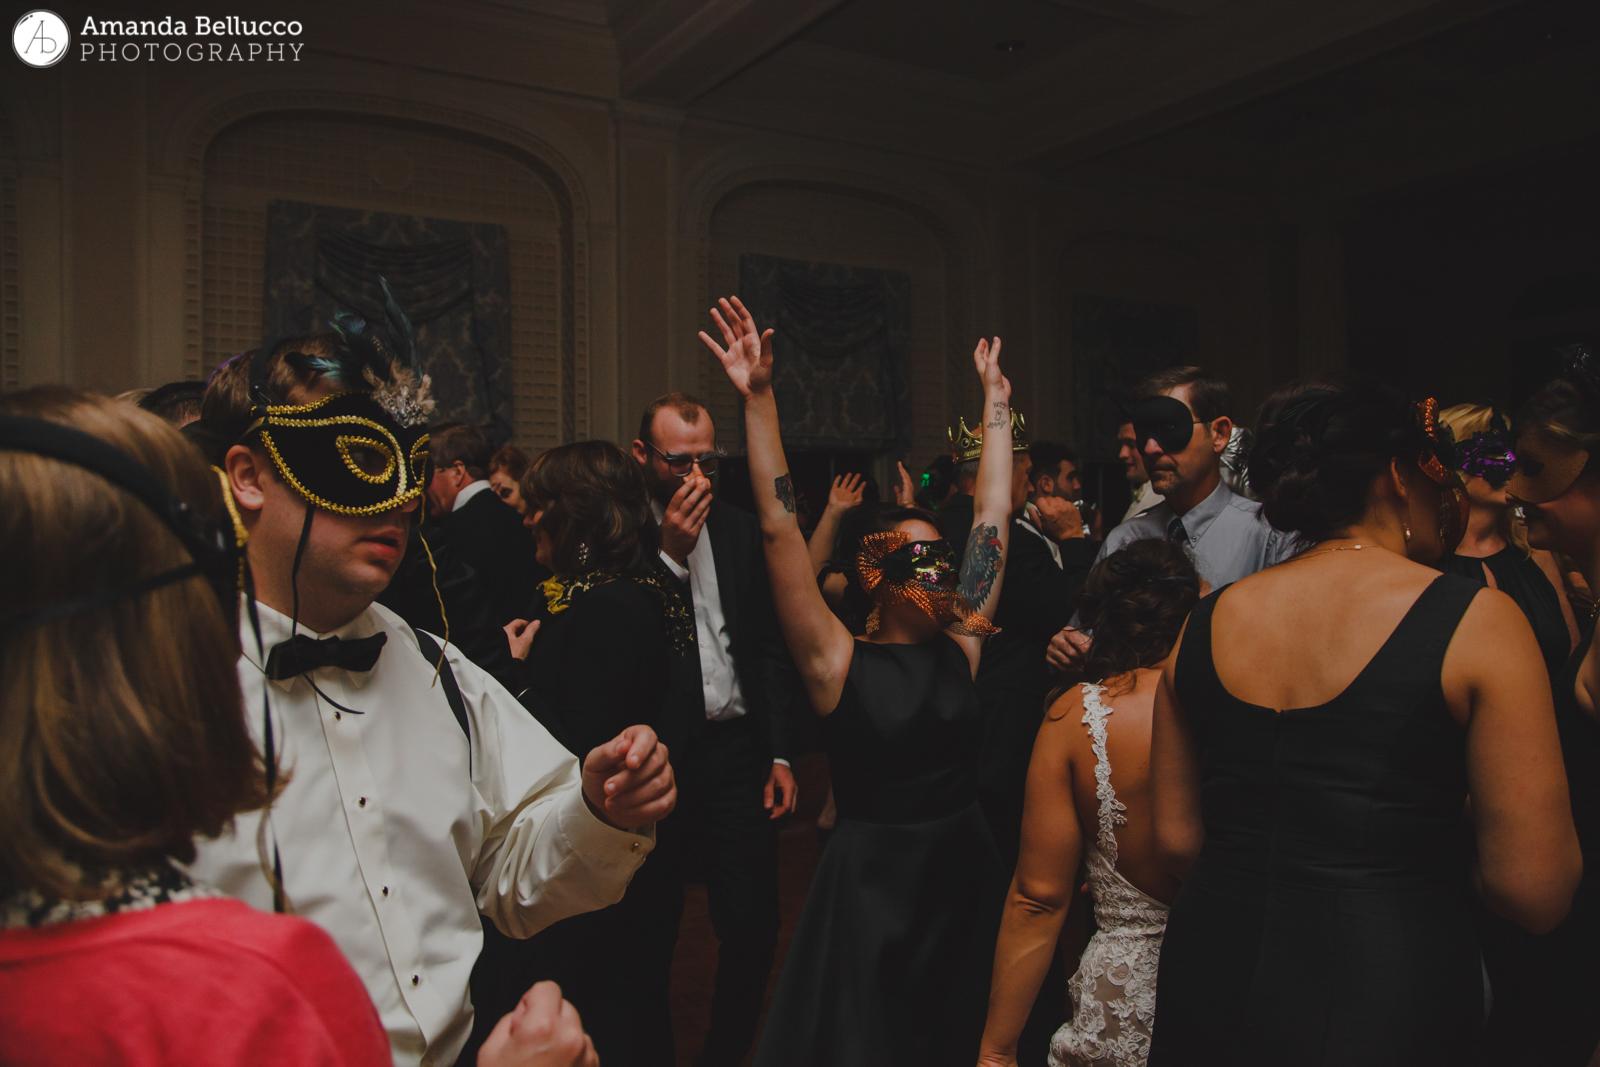 syracuse-rochester-fine-art-wedding-photographer-176.JPG